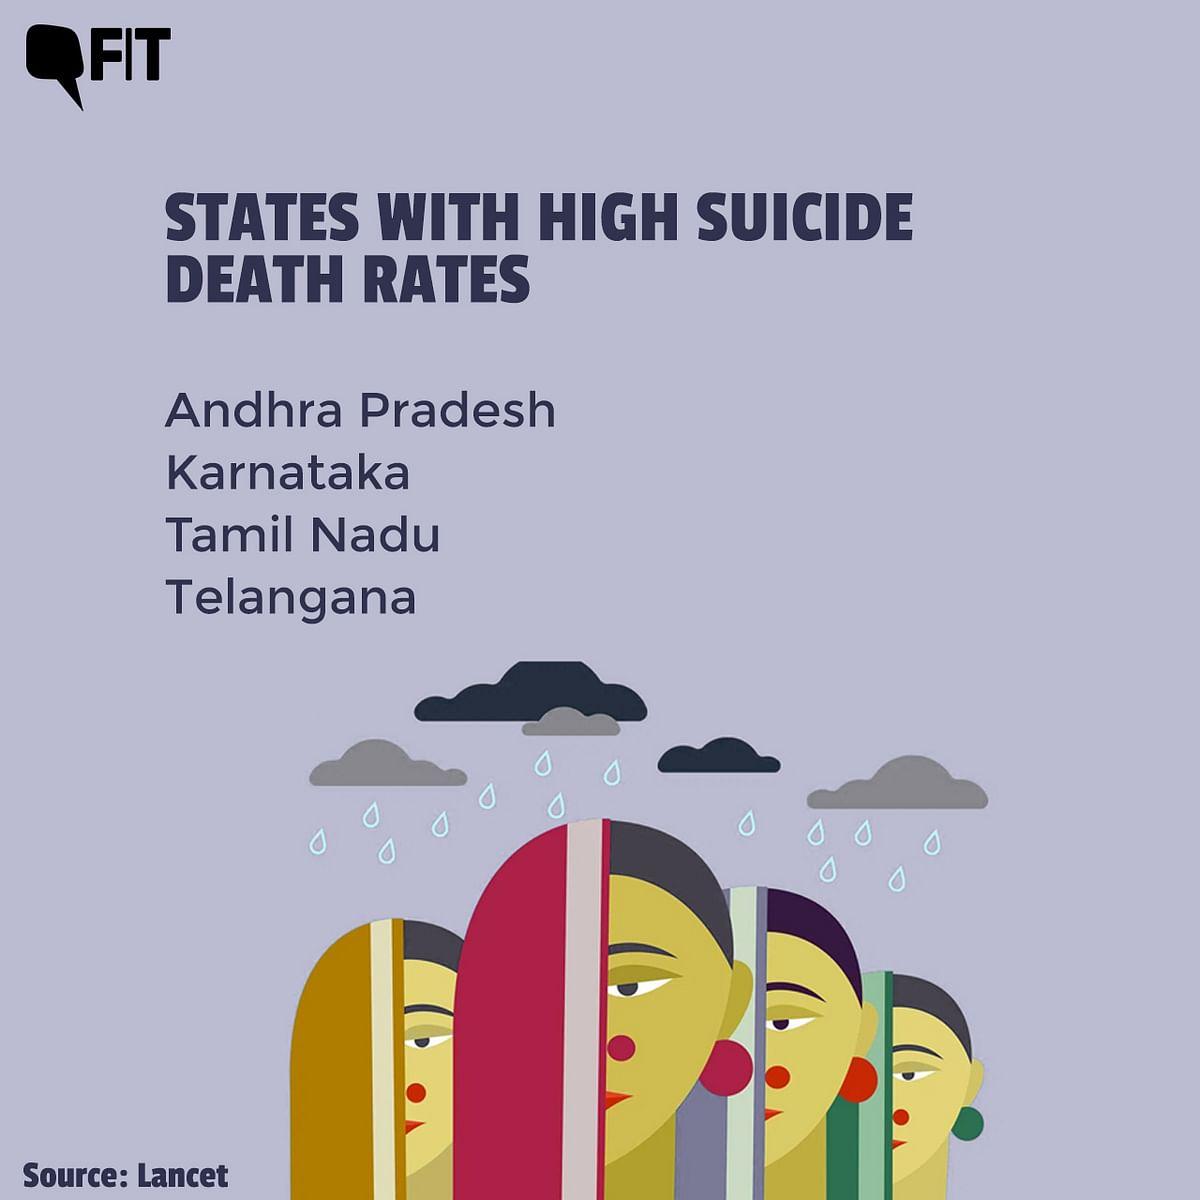 "<div class=""paragraphs""><p>The southern states of Andhra Pradesh, Karnataka, Tamil Nadu, and Telangana had high suicide death rates for both men &amp; women.</p></div>"